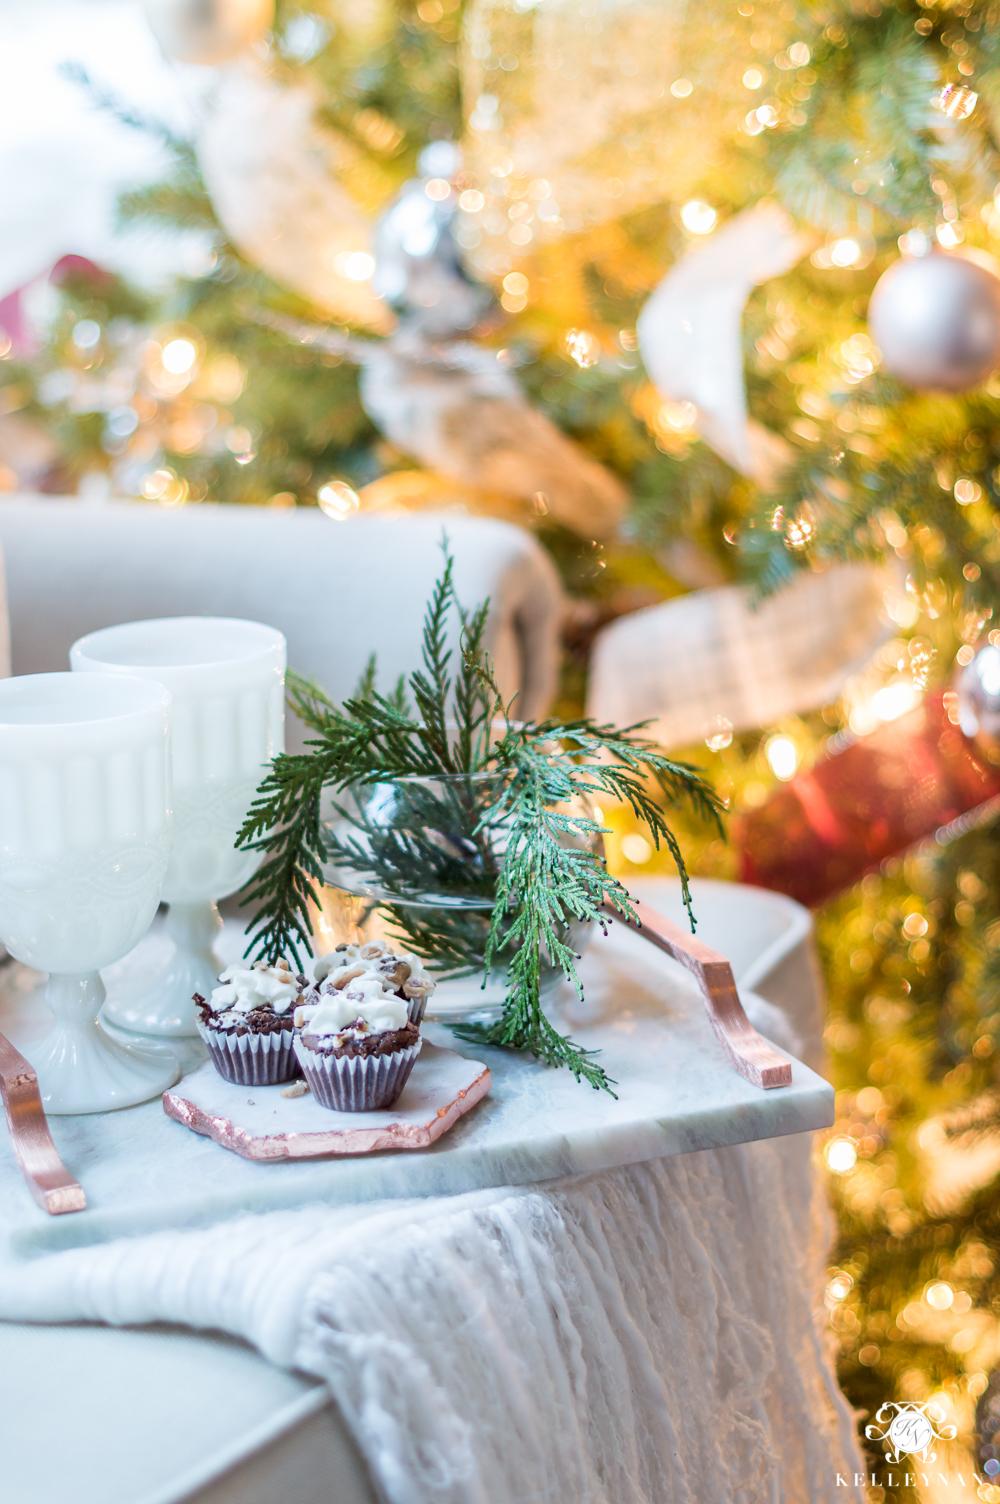 Brownie Bite holiday recipe